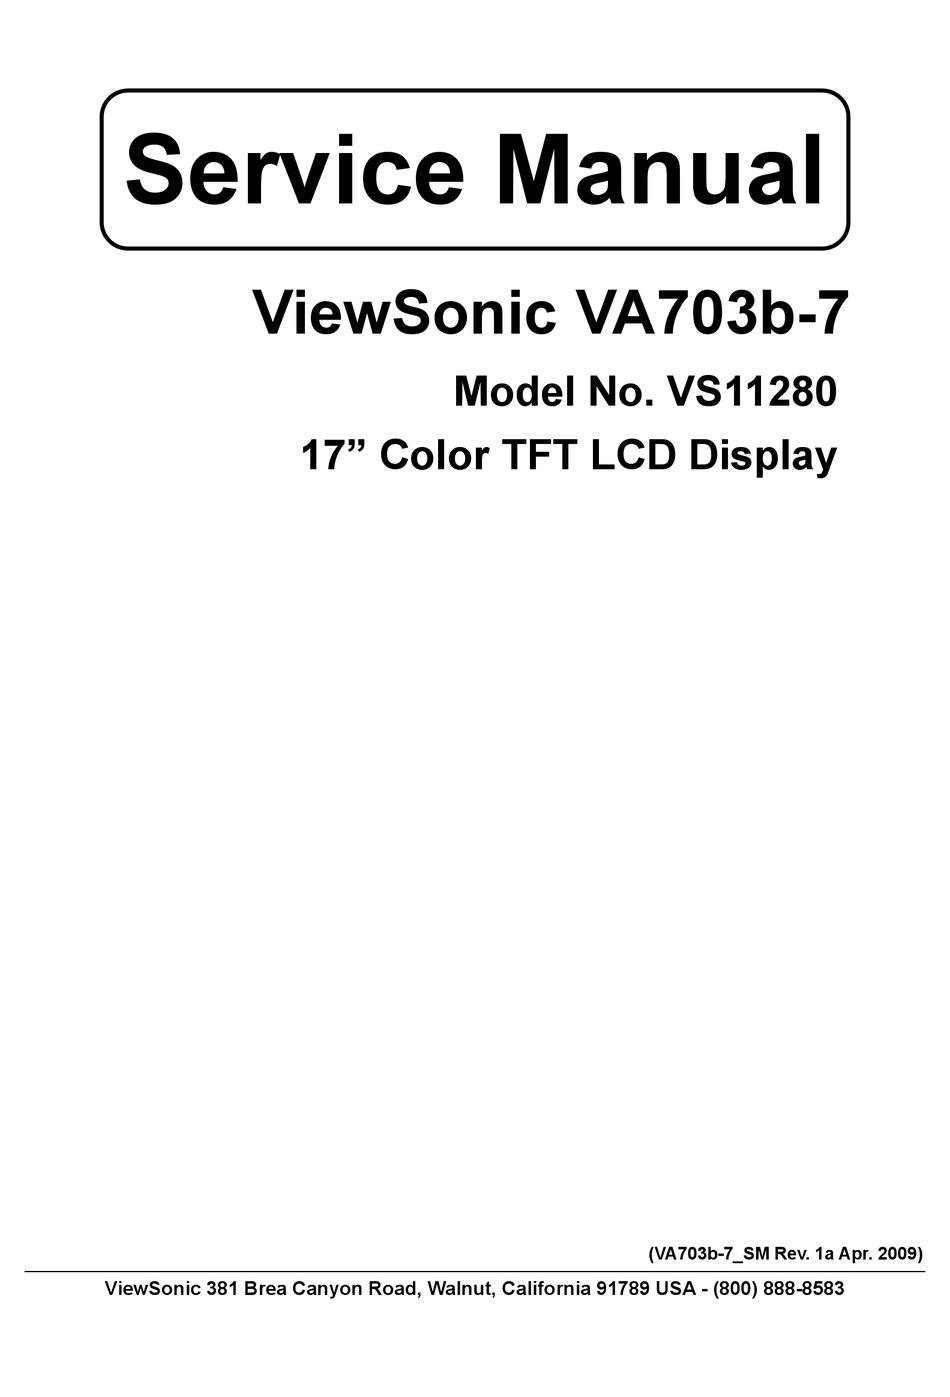 Viewsonic Vs11280 Service Manual Pdf Download Manualslib